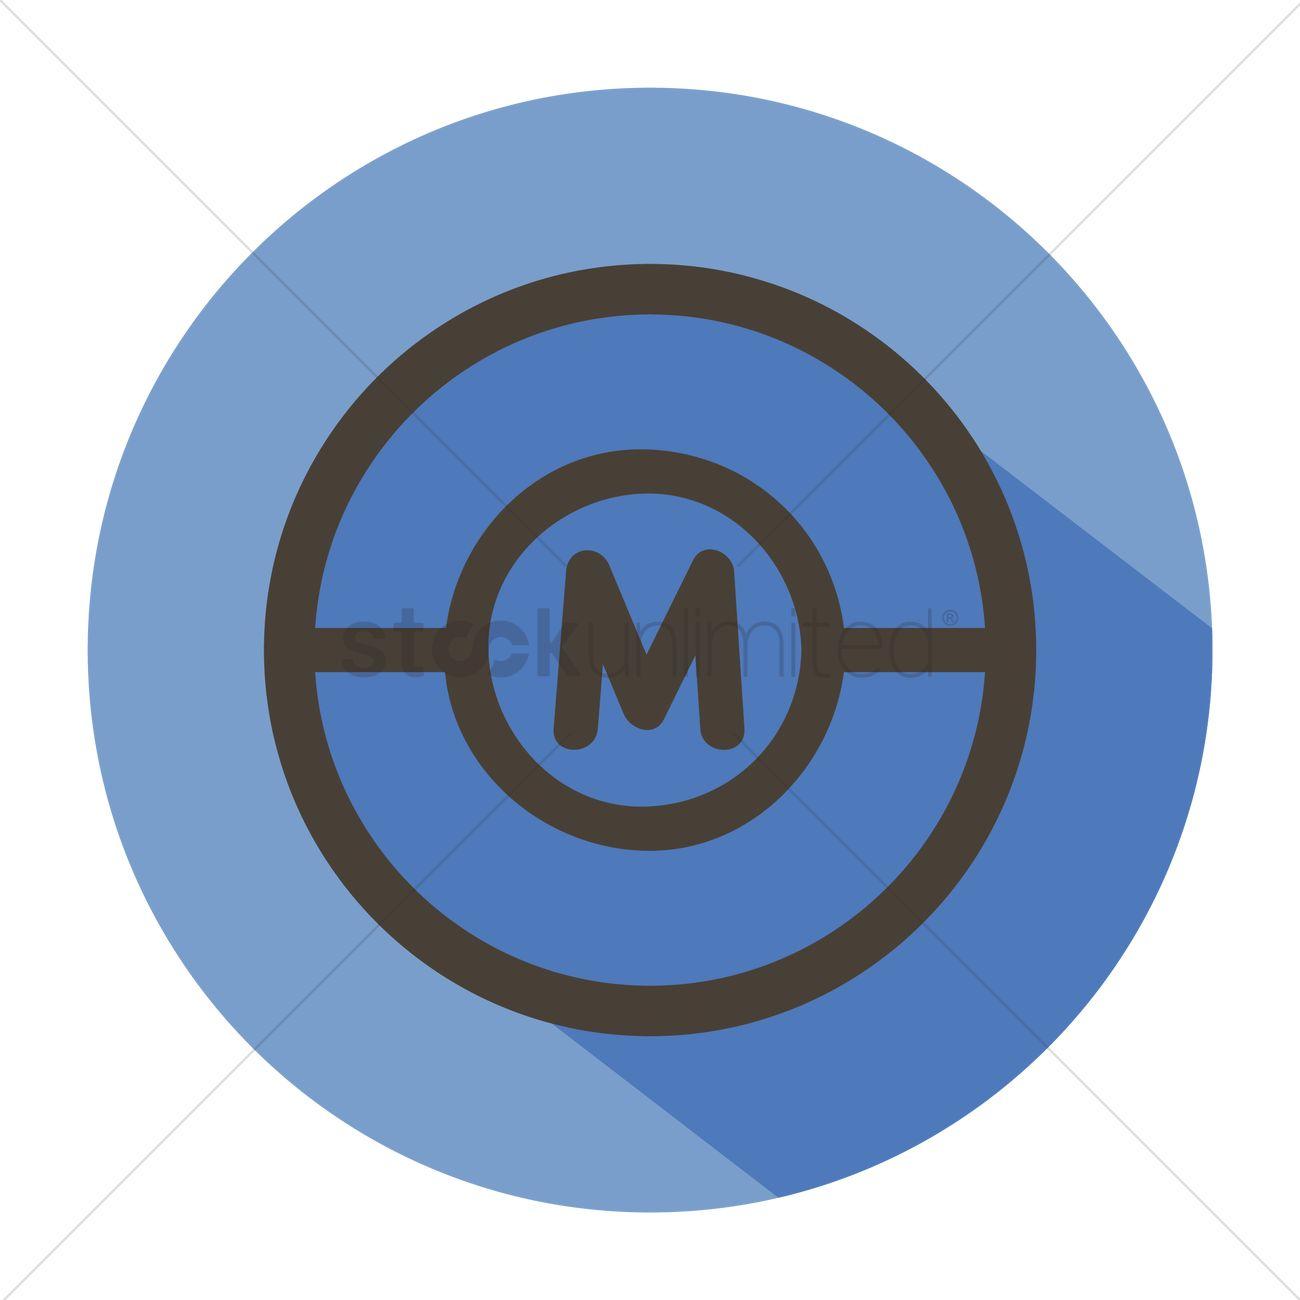 Unique Circuit Symbol For A Motor Motif - Electrical System Block ...